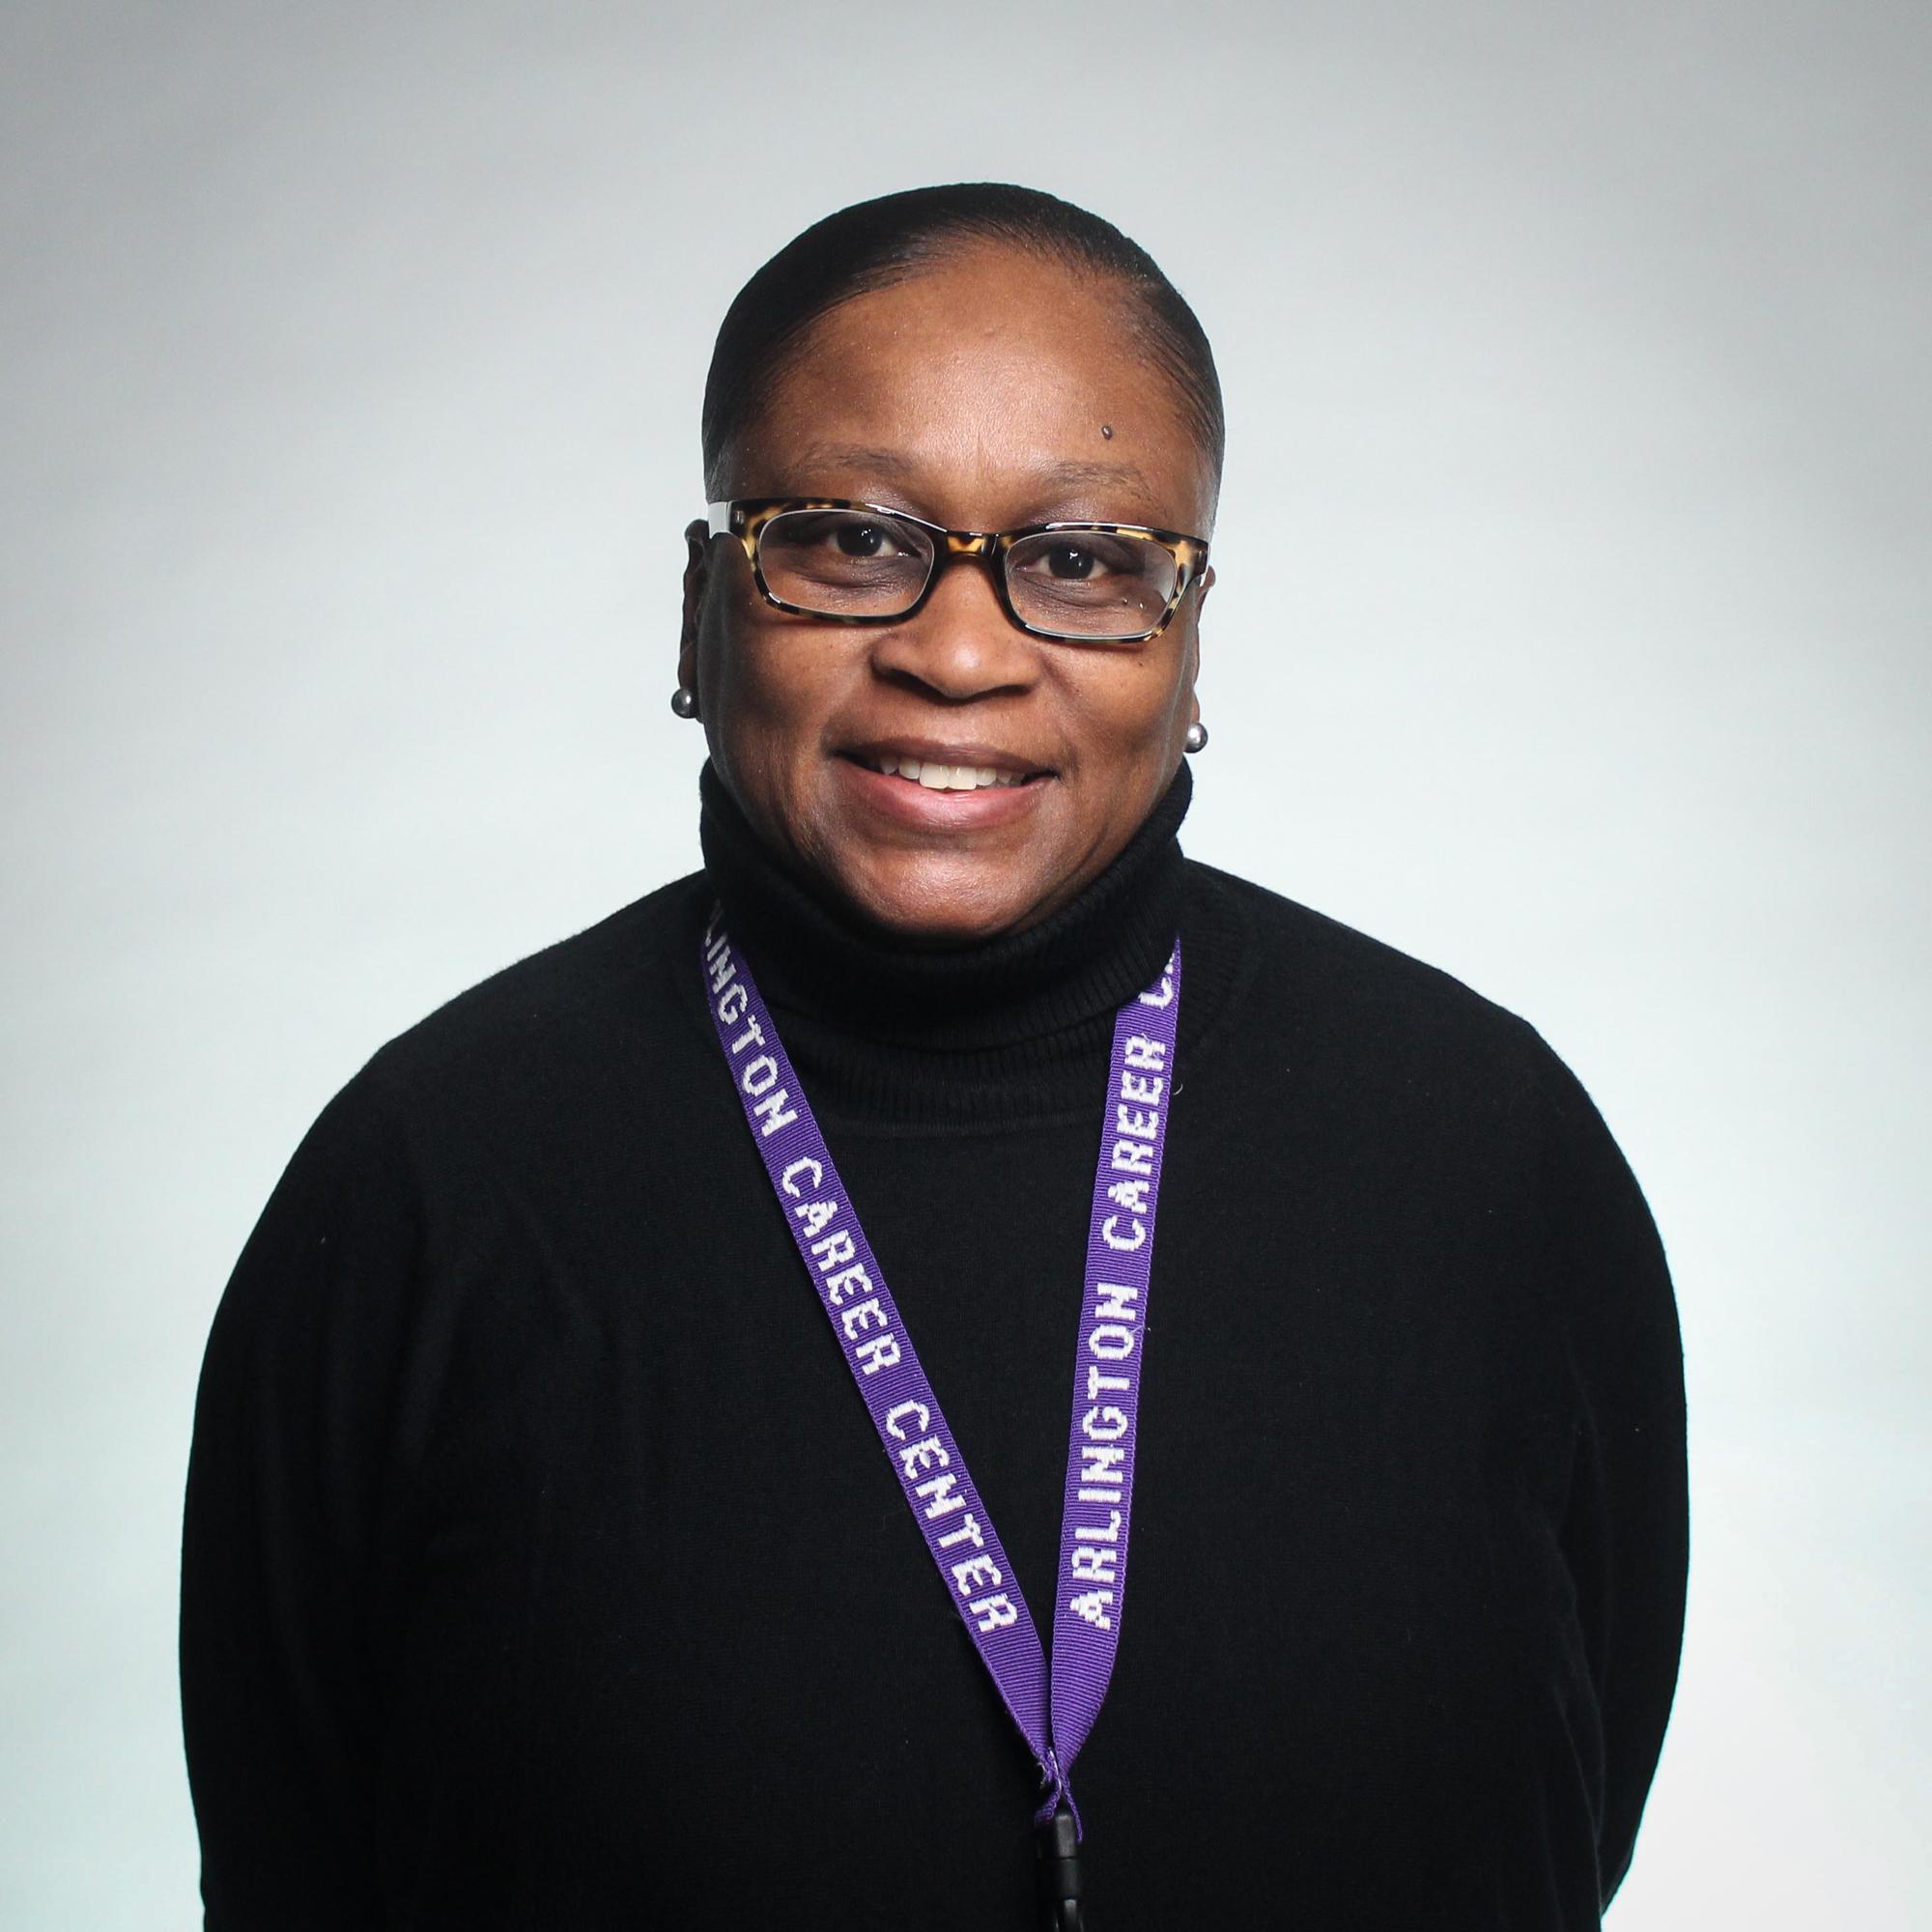 Ms. Lori McFail